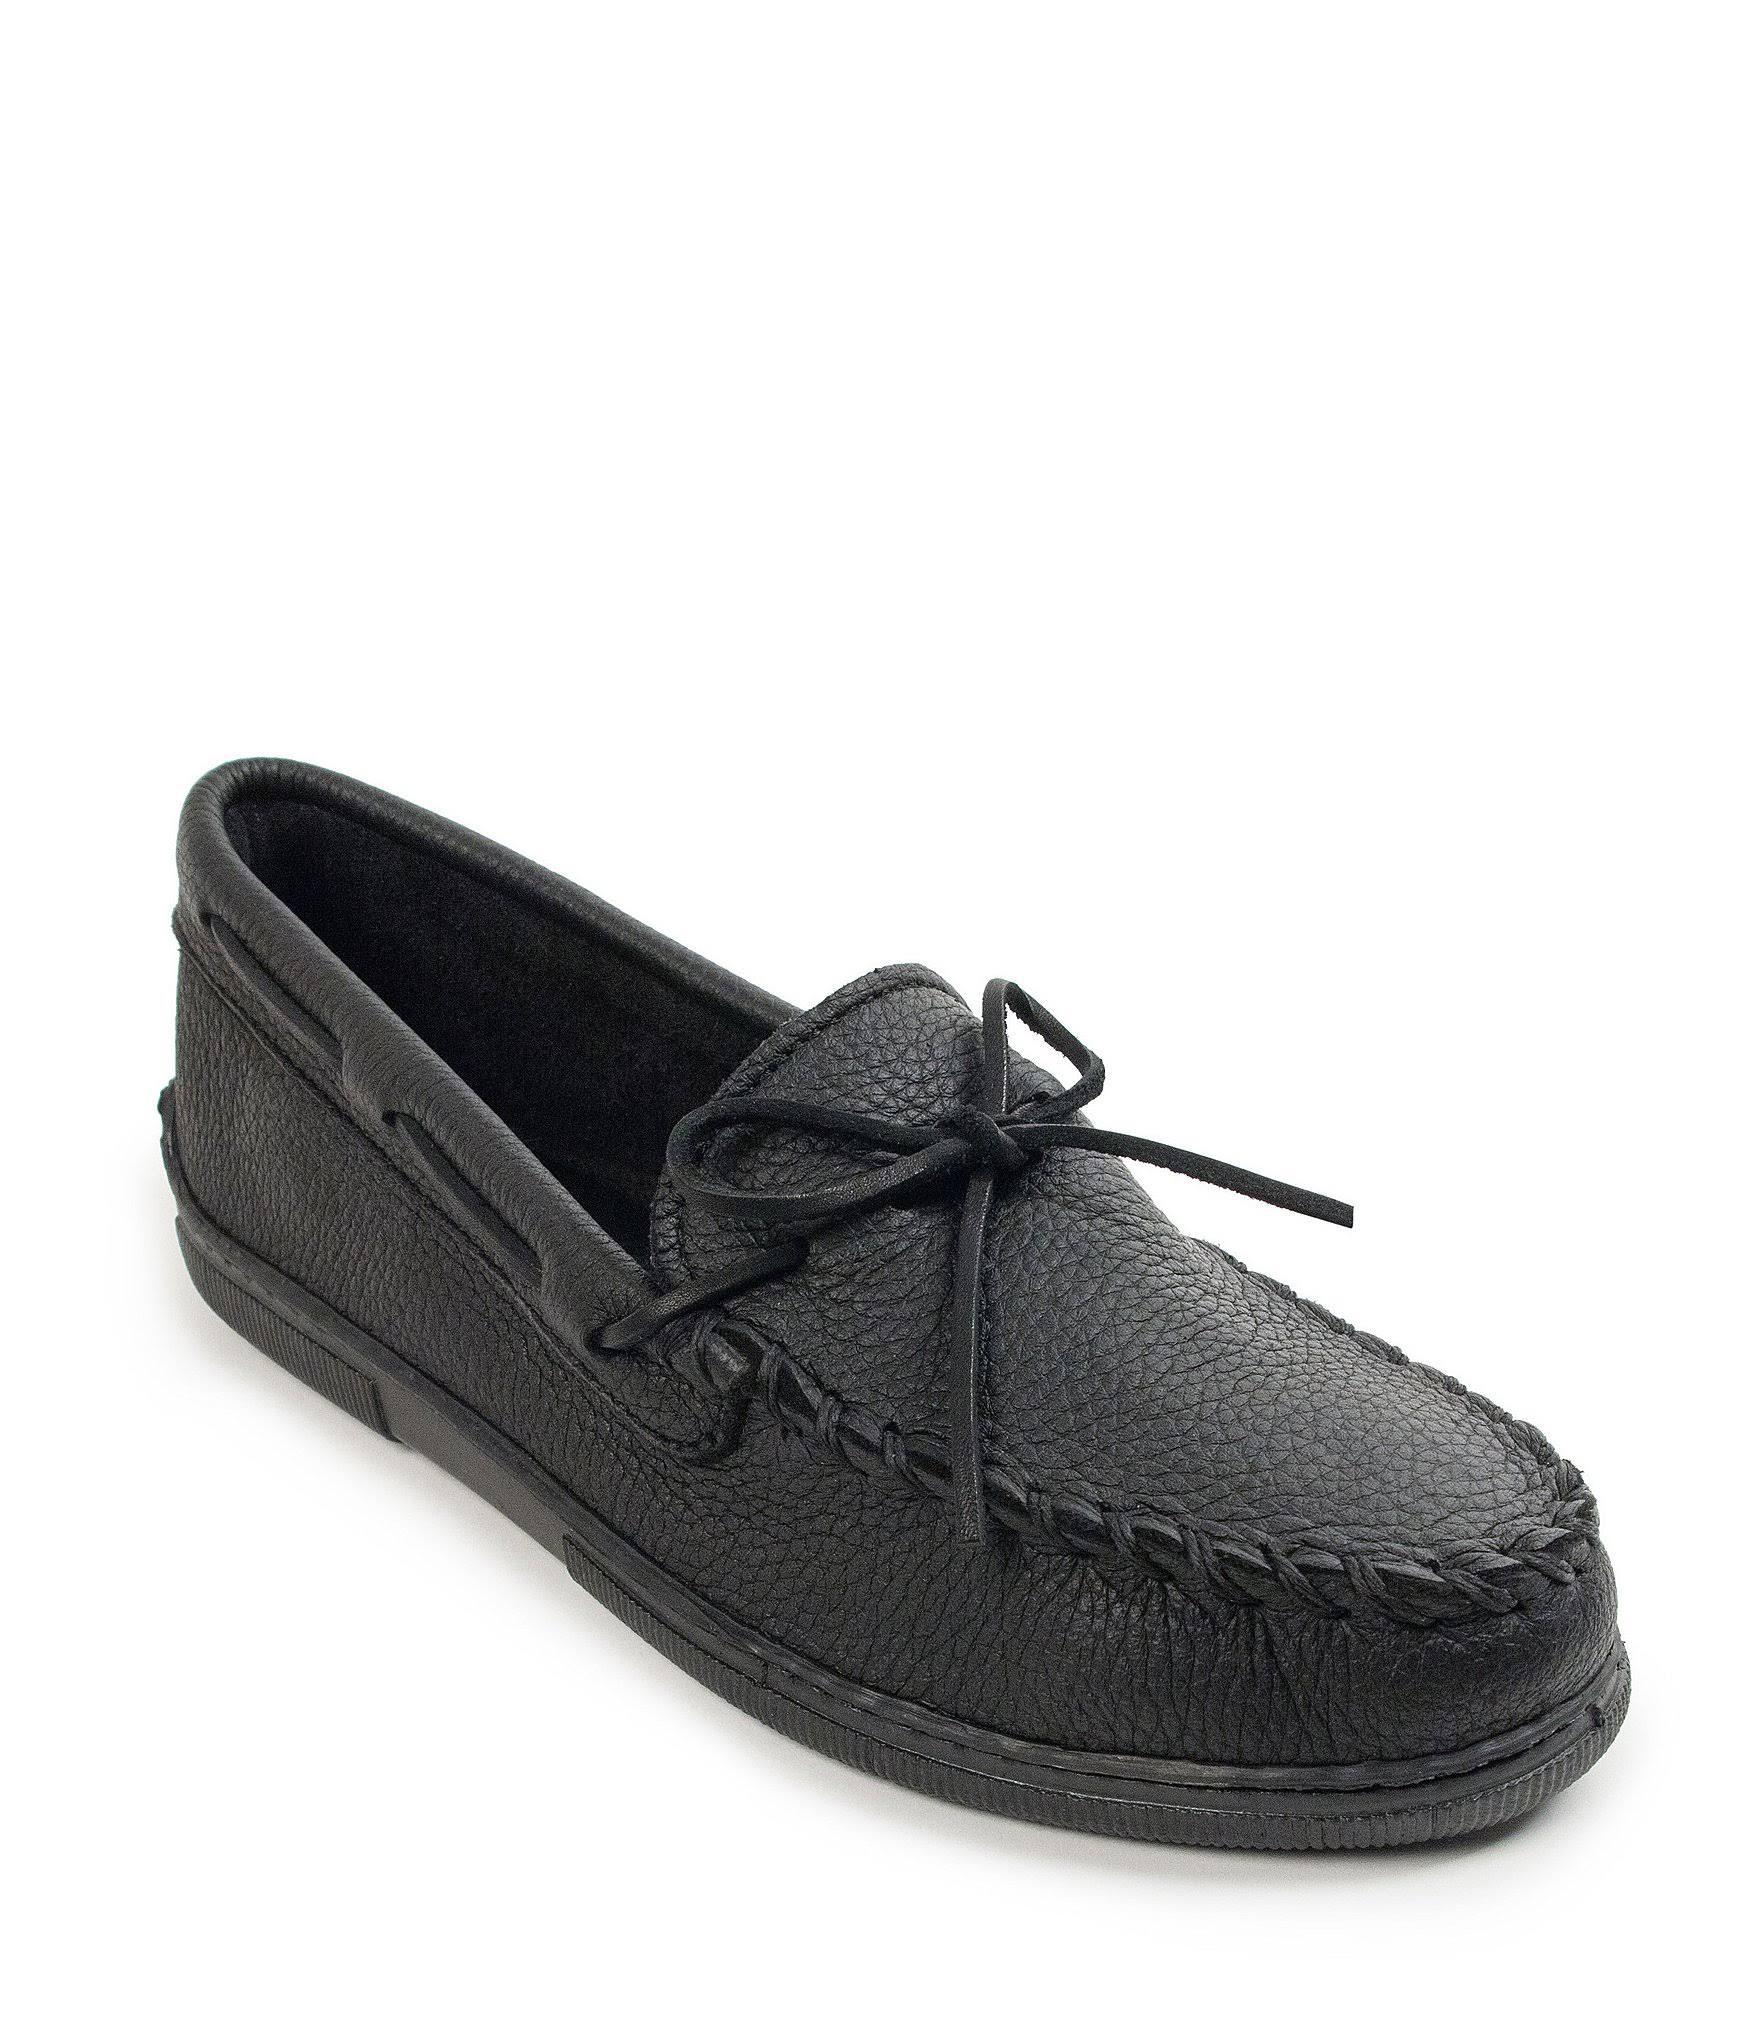 En Mens Negro W Moosehide Classic Minnetonka Shoes 12 Casual nA80qnwRC